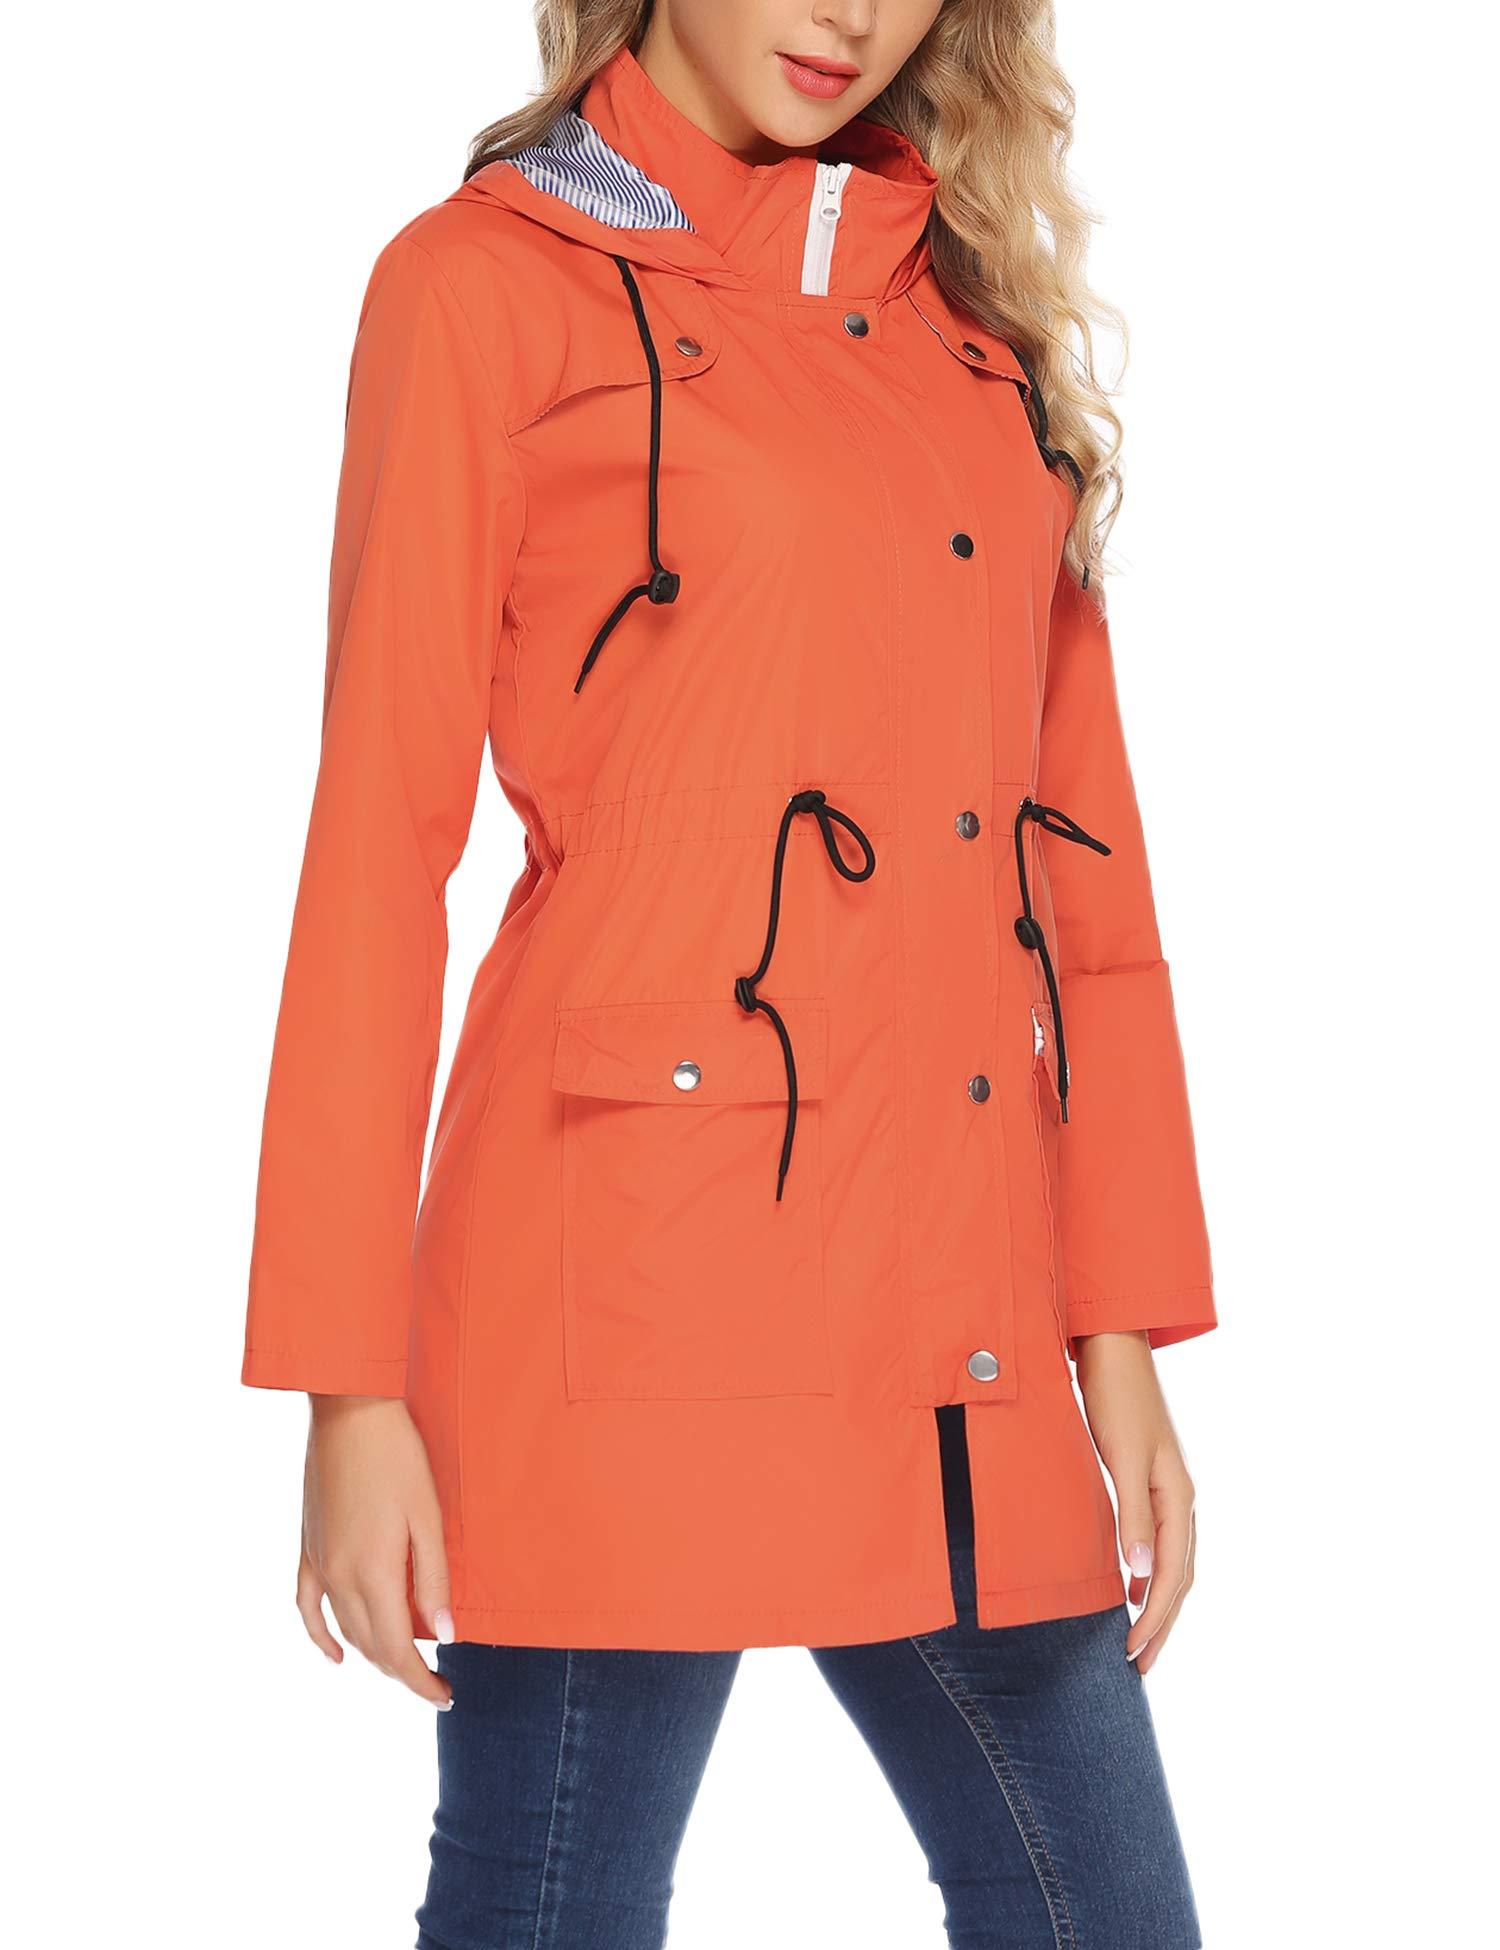 Aiboria Womens Waterproof Lightweight Windbreaker Raincoat Hooded Rain Jacket